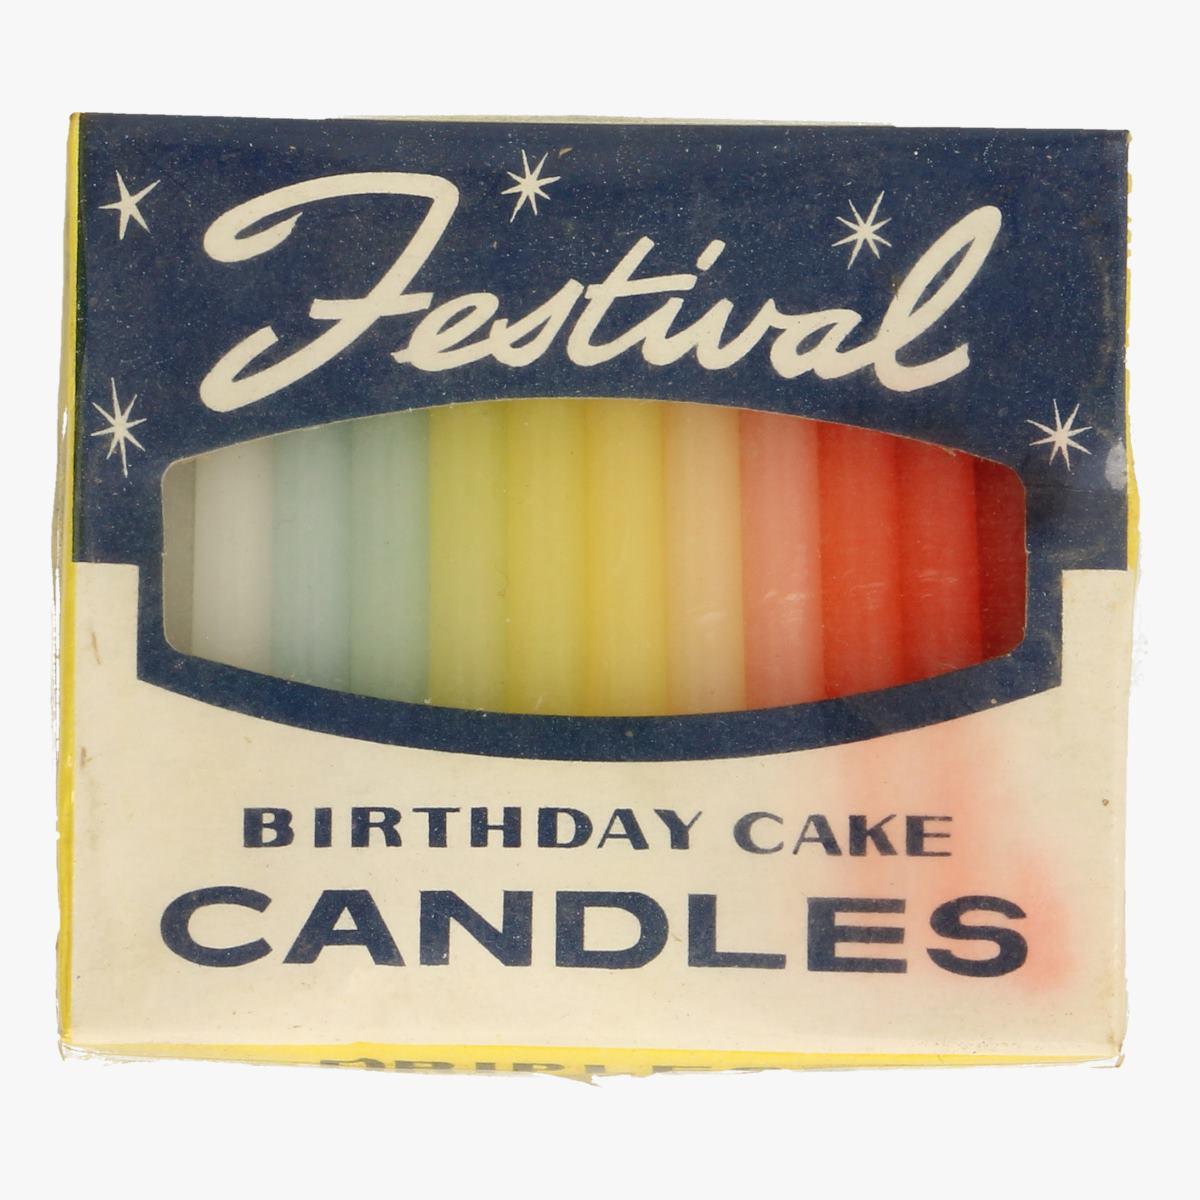 Afbeeldingen van festival birthday cake candles dripliss smokeless 25 st